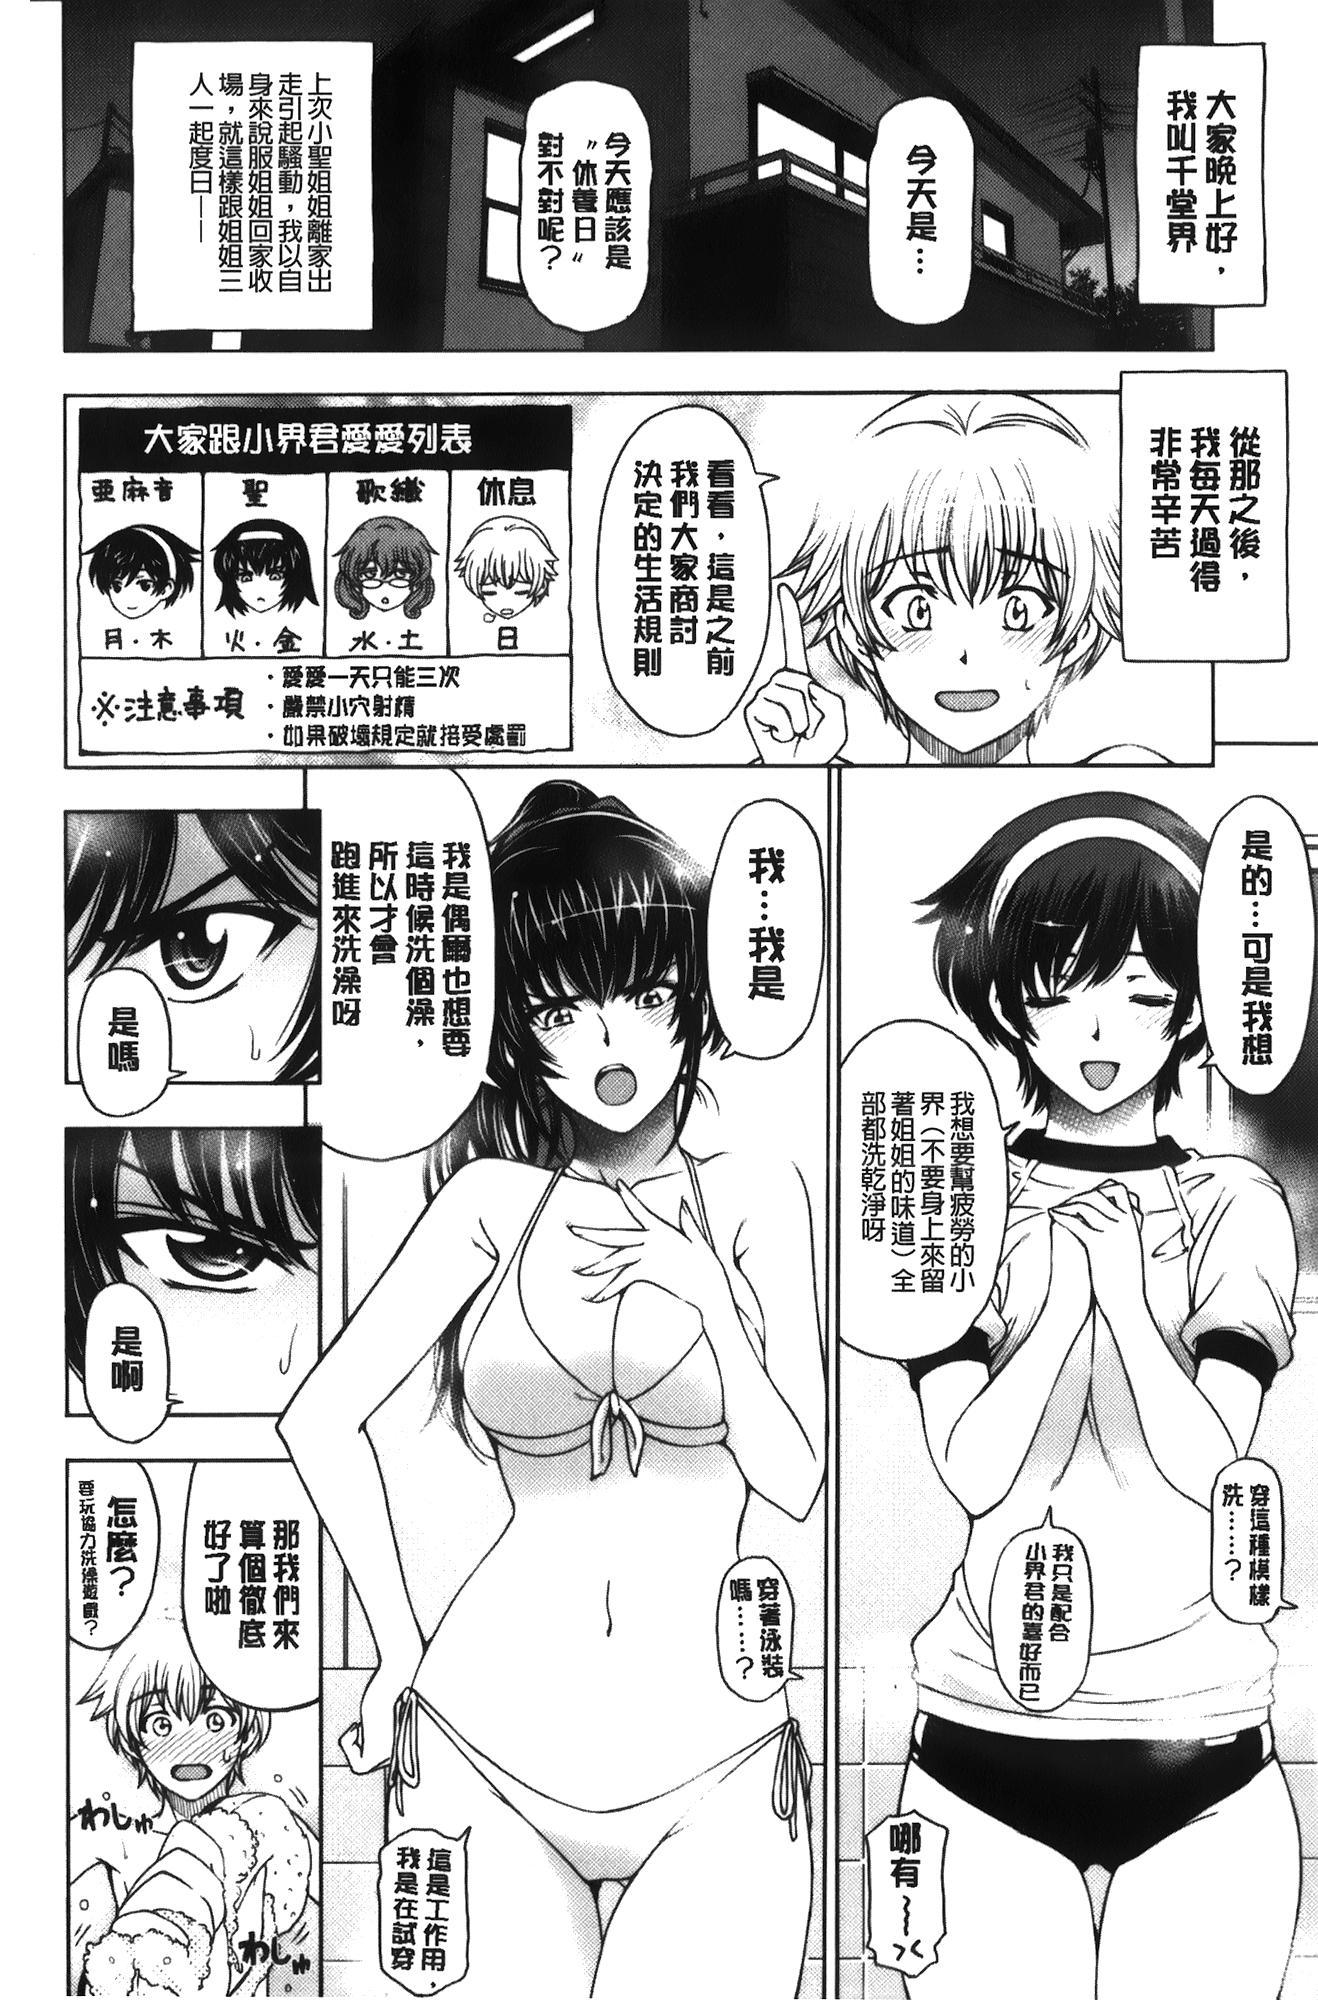 Majo × Shota ~ Genteiban | 魔女X小正太 限定版 218